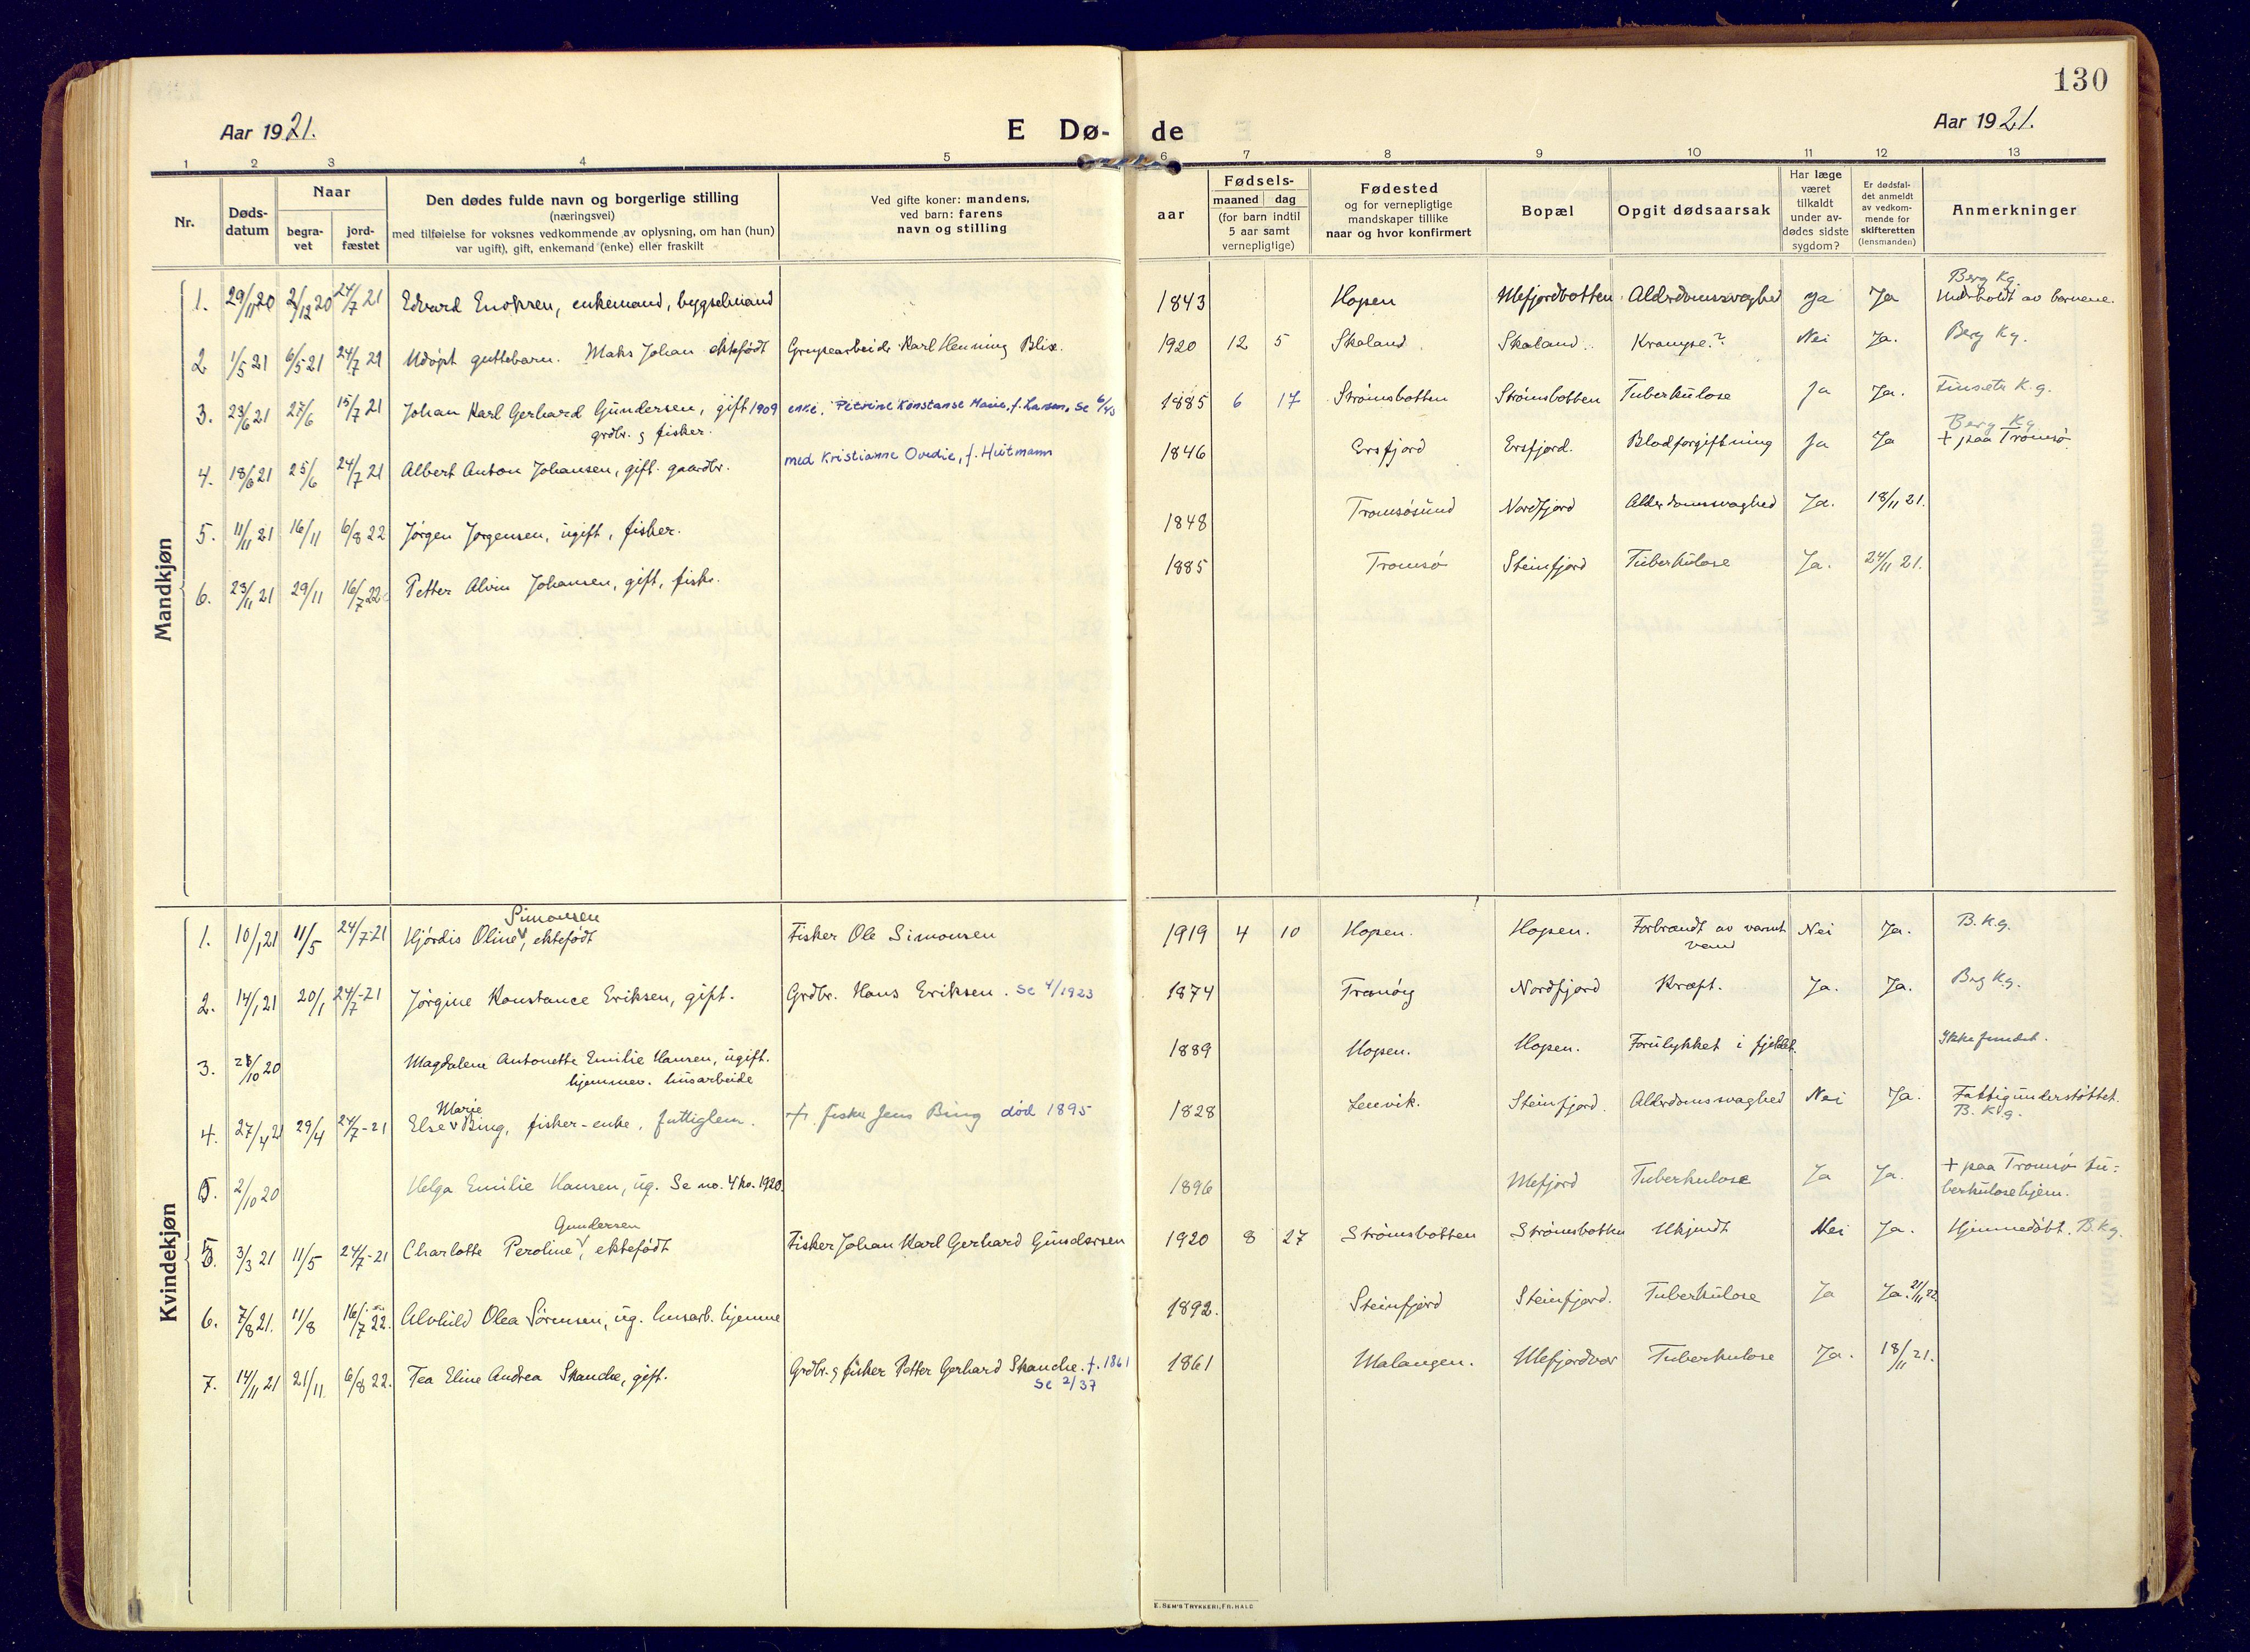 SATØ, Mefjord/Berg sokneprestkontor, G/Ga/Gaa: Ministerialbok nr. 9, 1916-1928, s. 130